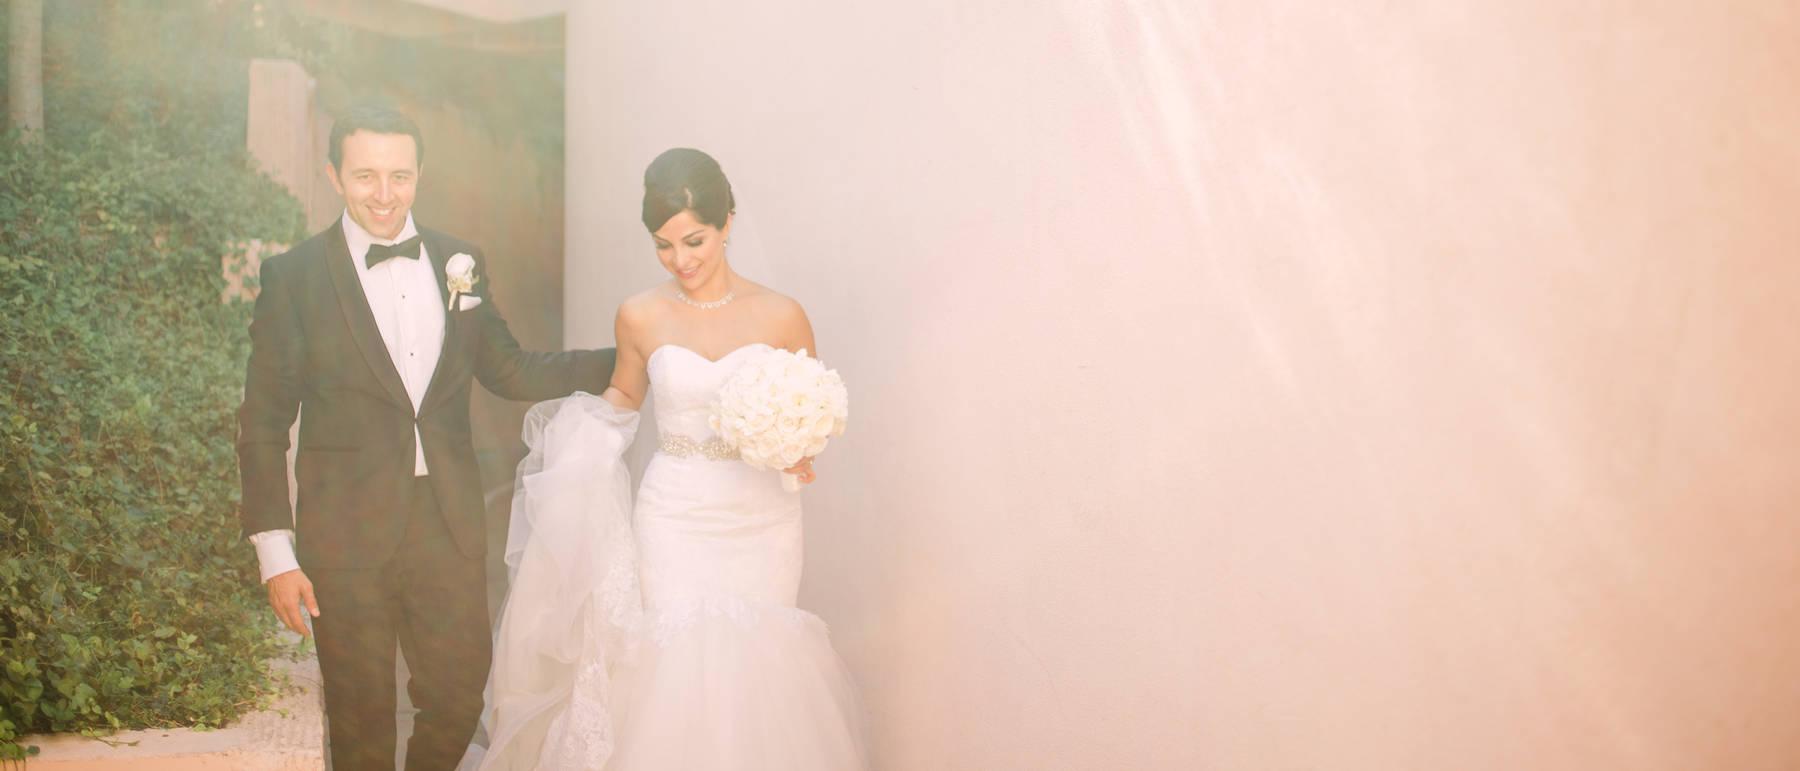 johnandjoseph-wedding-photographer-hz-slider-122